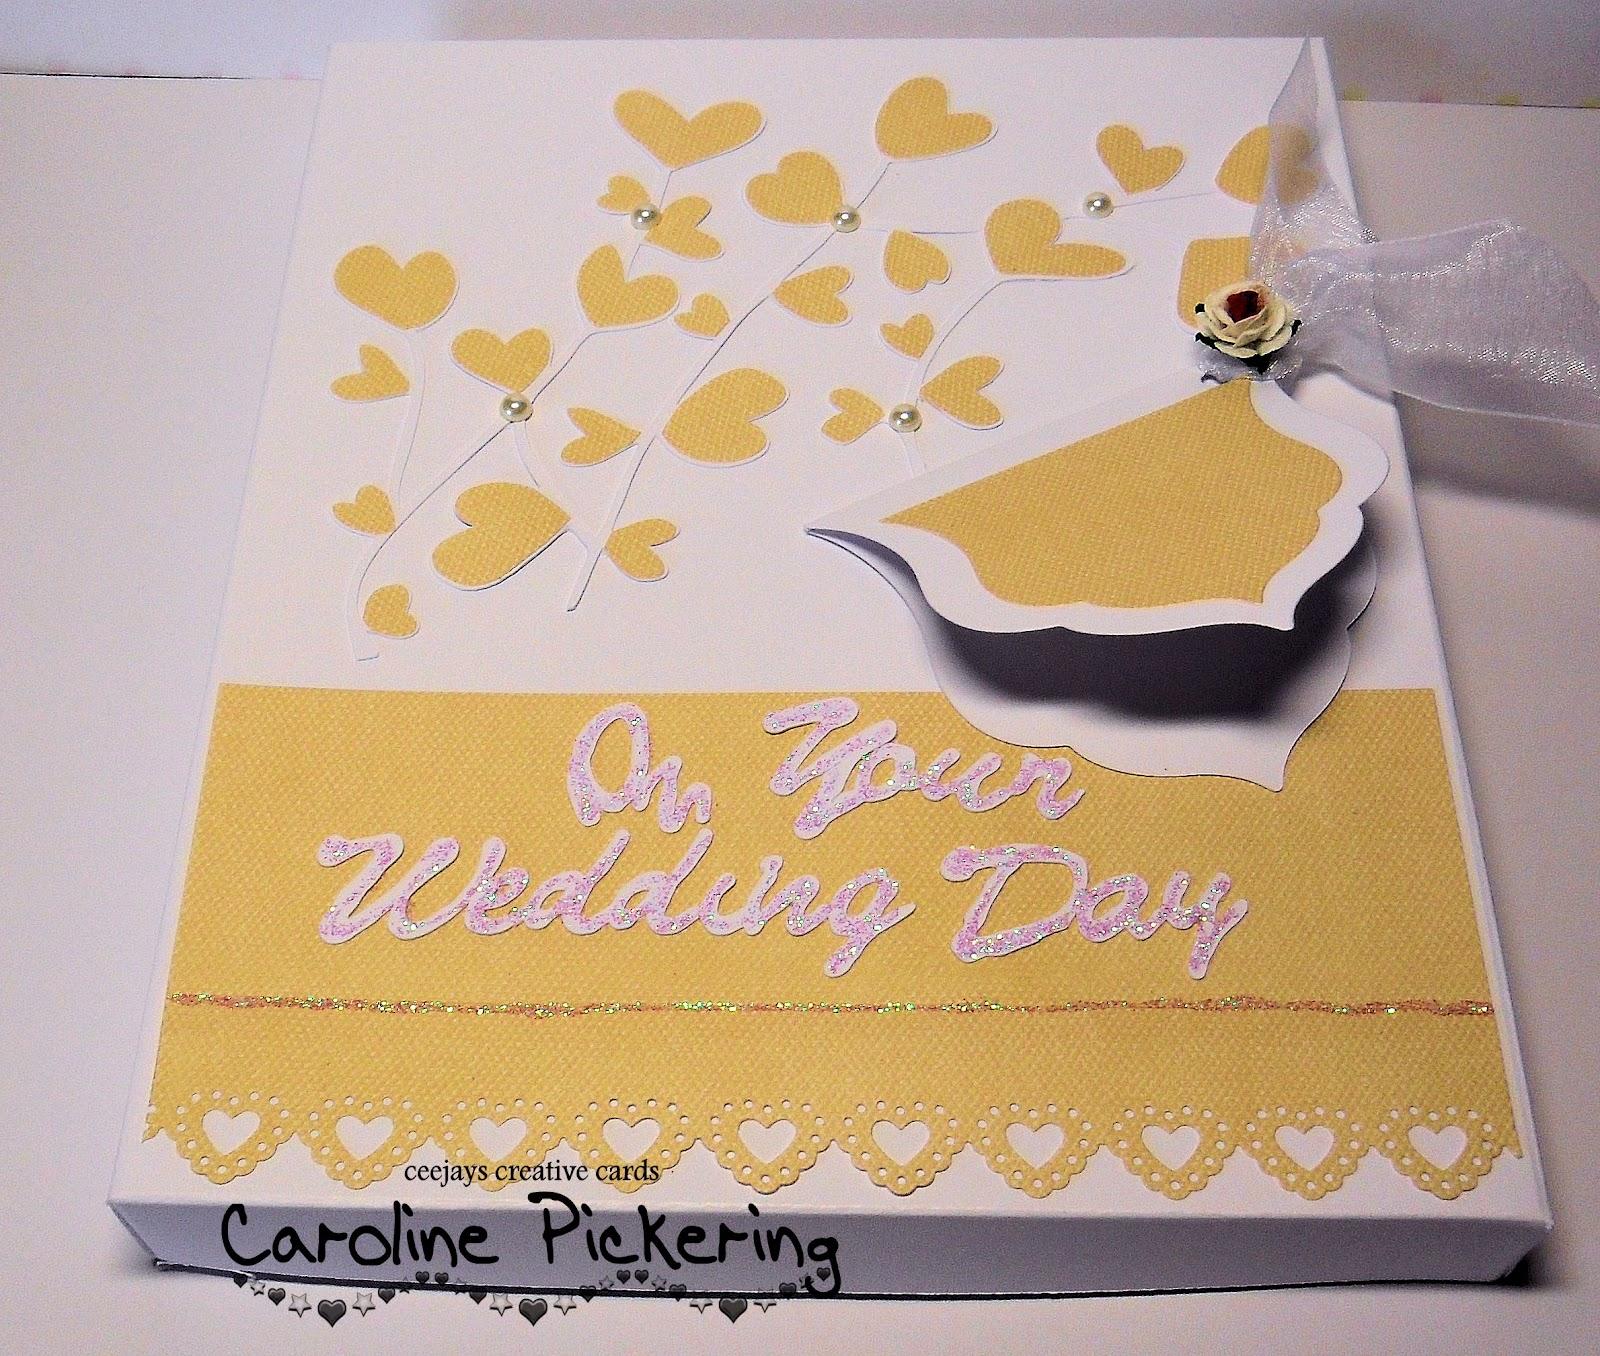 CJs Creative Cards Wedding Cake Shaped Card